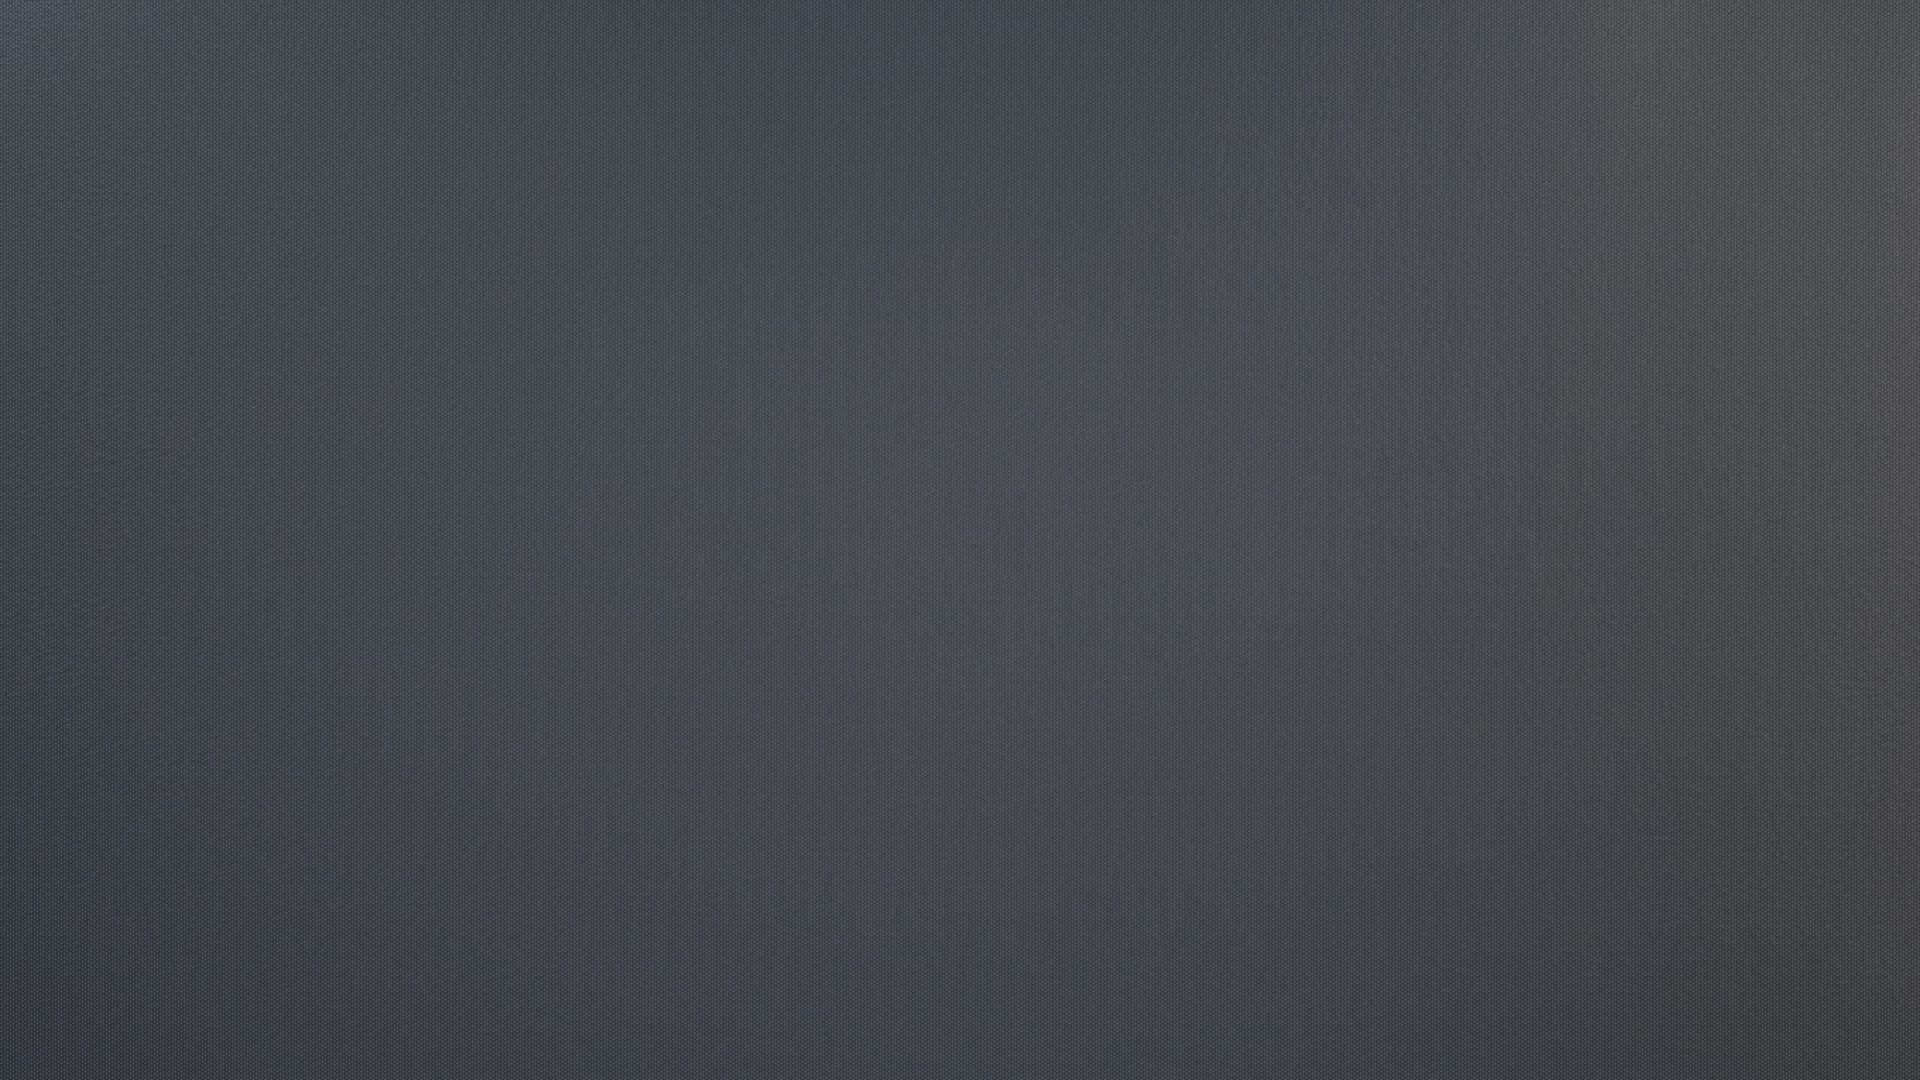 Download Wallpaper Texture Surface Band Gray Free Desktop Wallpaper ...